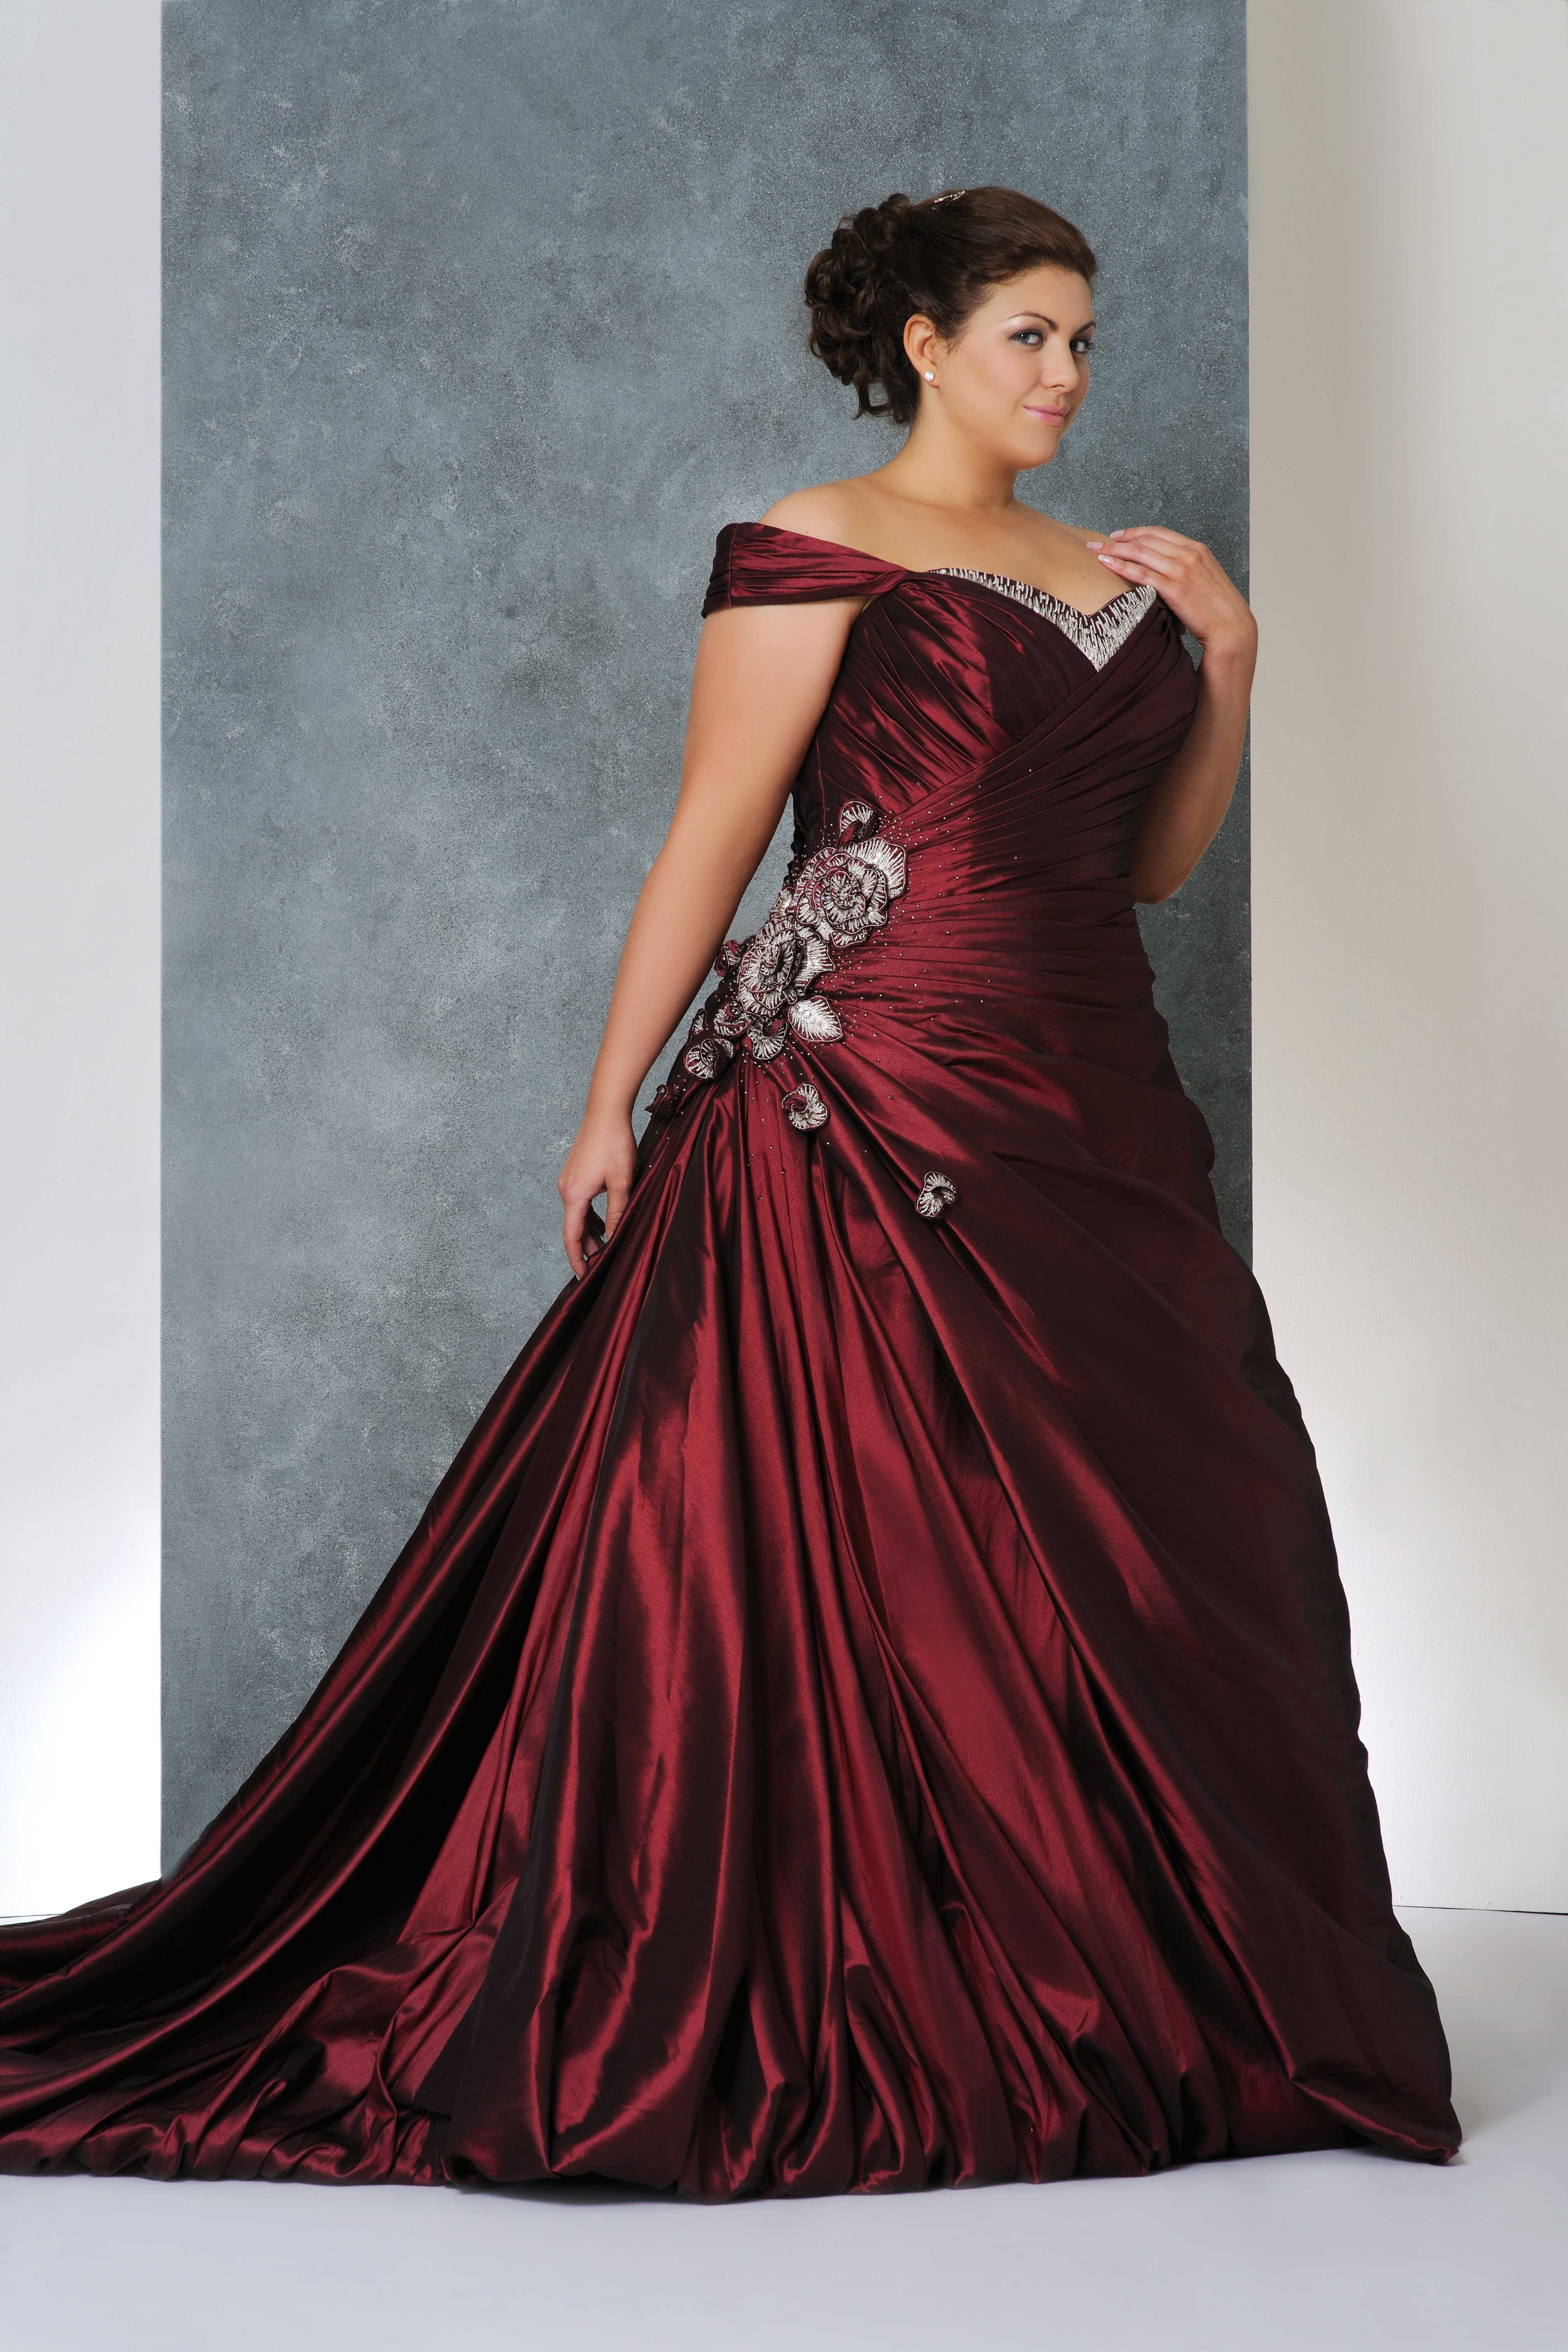 Wedding dresses for big women  Colored Wedding Dresses for Plus Size Women Photo  Wedding Ideas